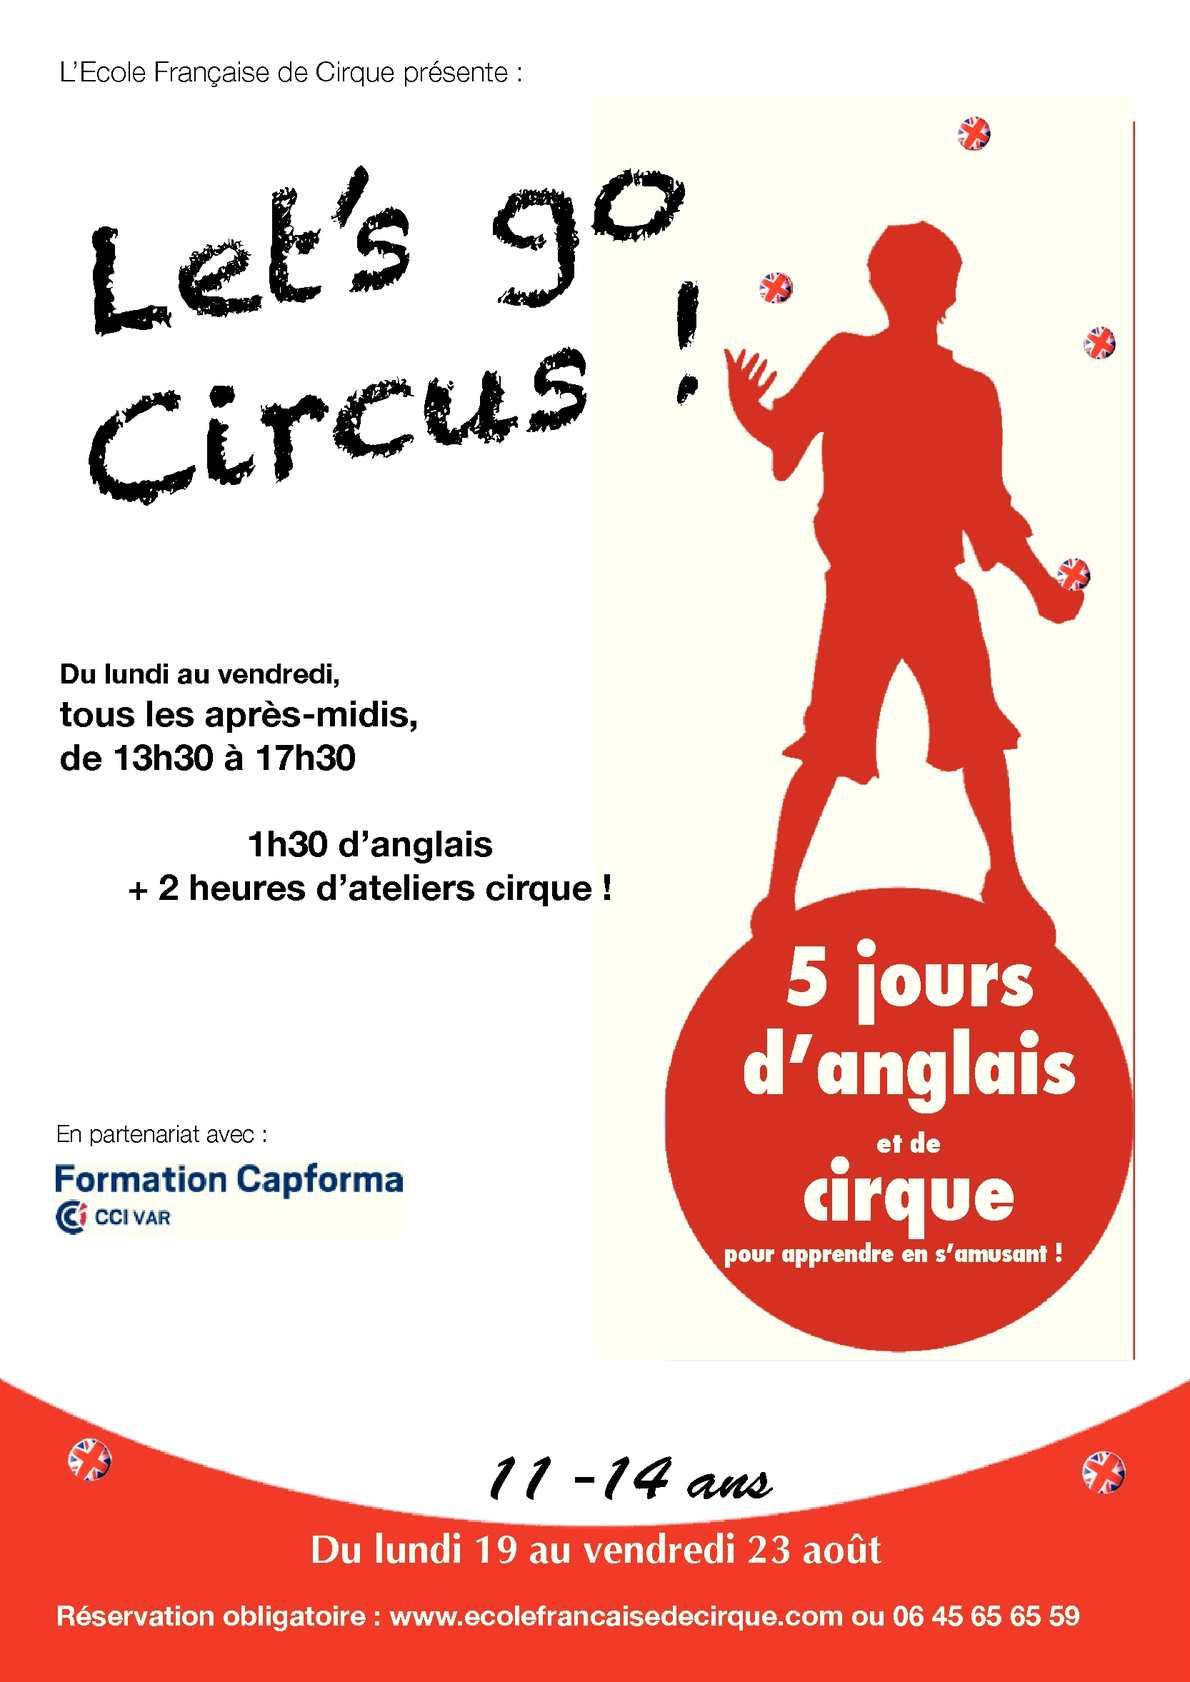 Calam o let 39 s go circus 2013 stage anglais cirque par l - Chambre de commerce en anglais ...